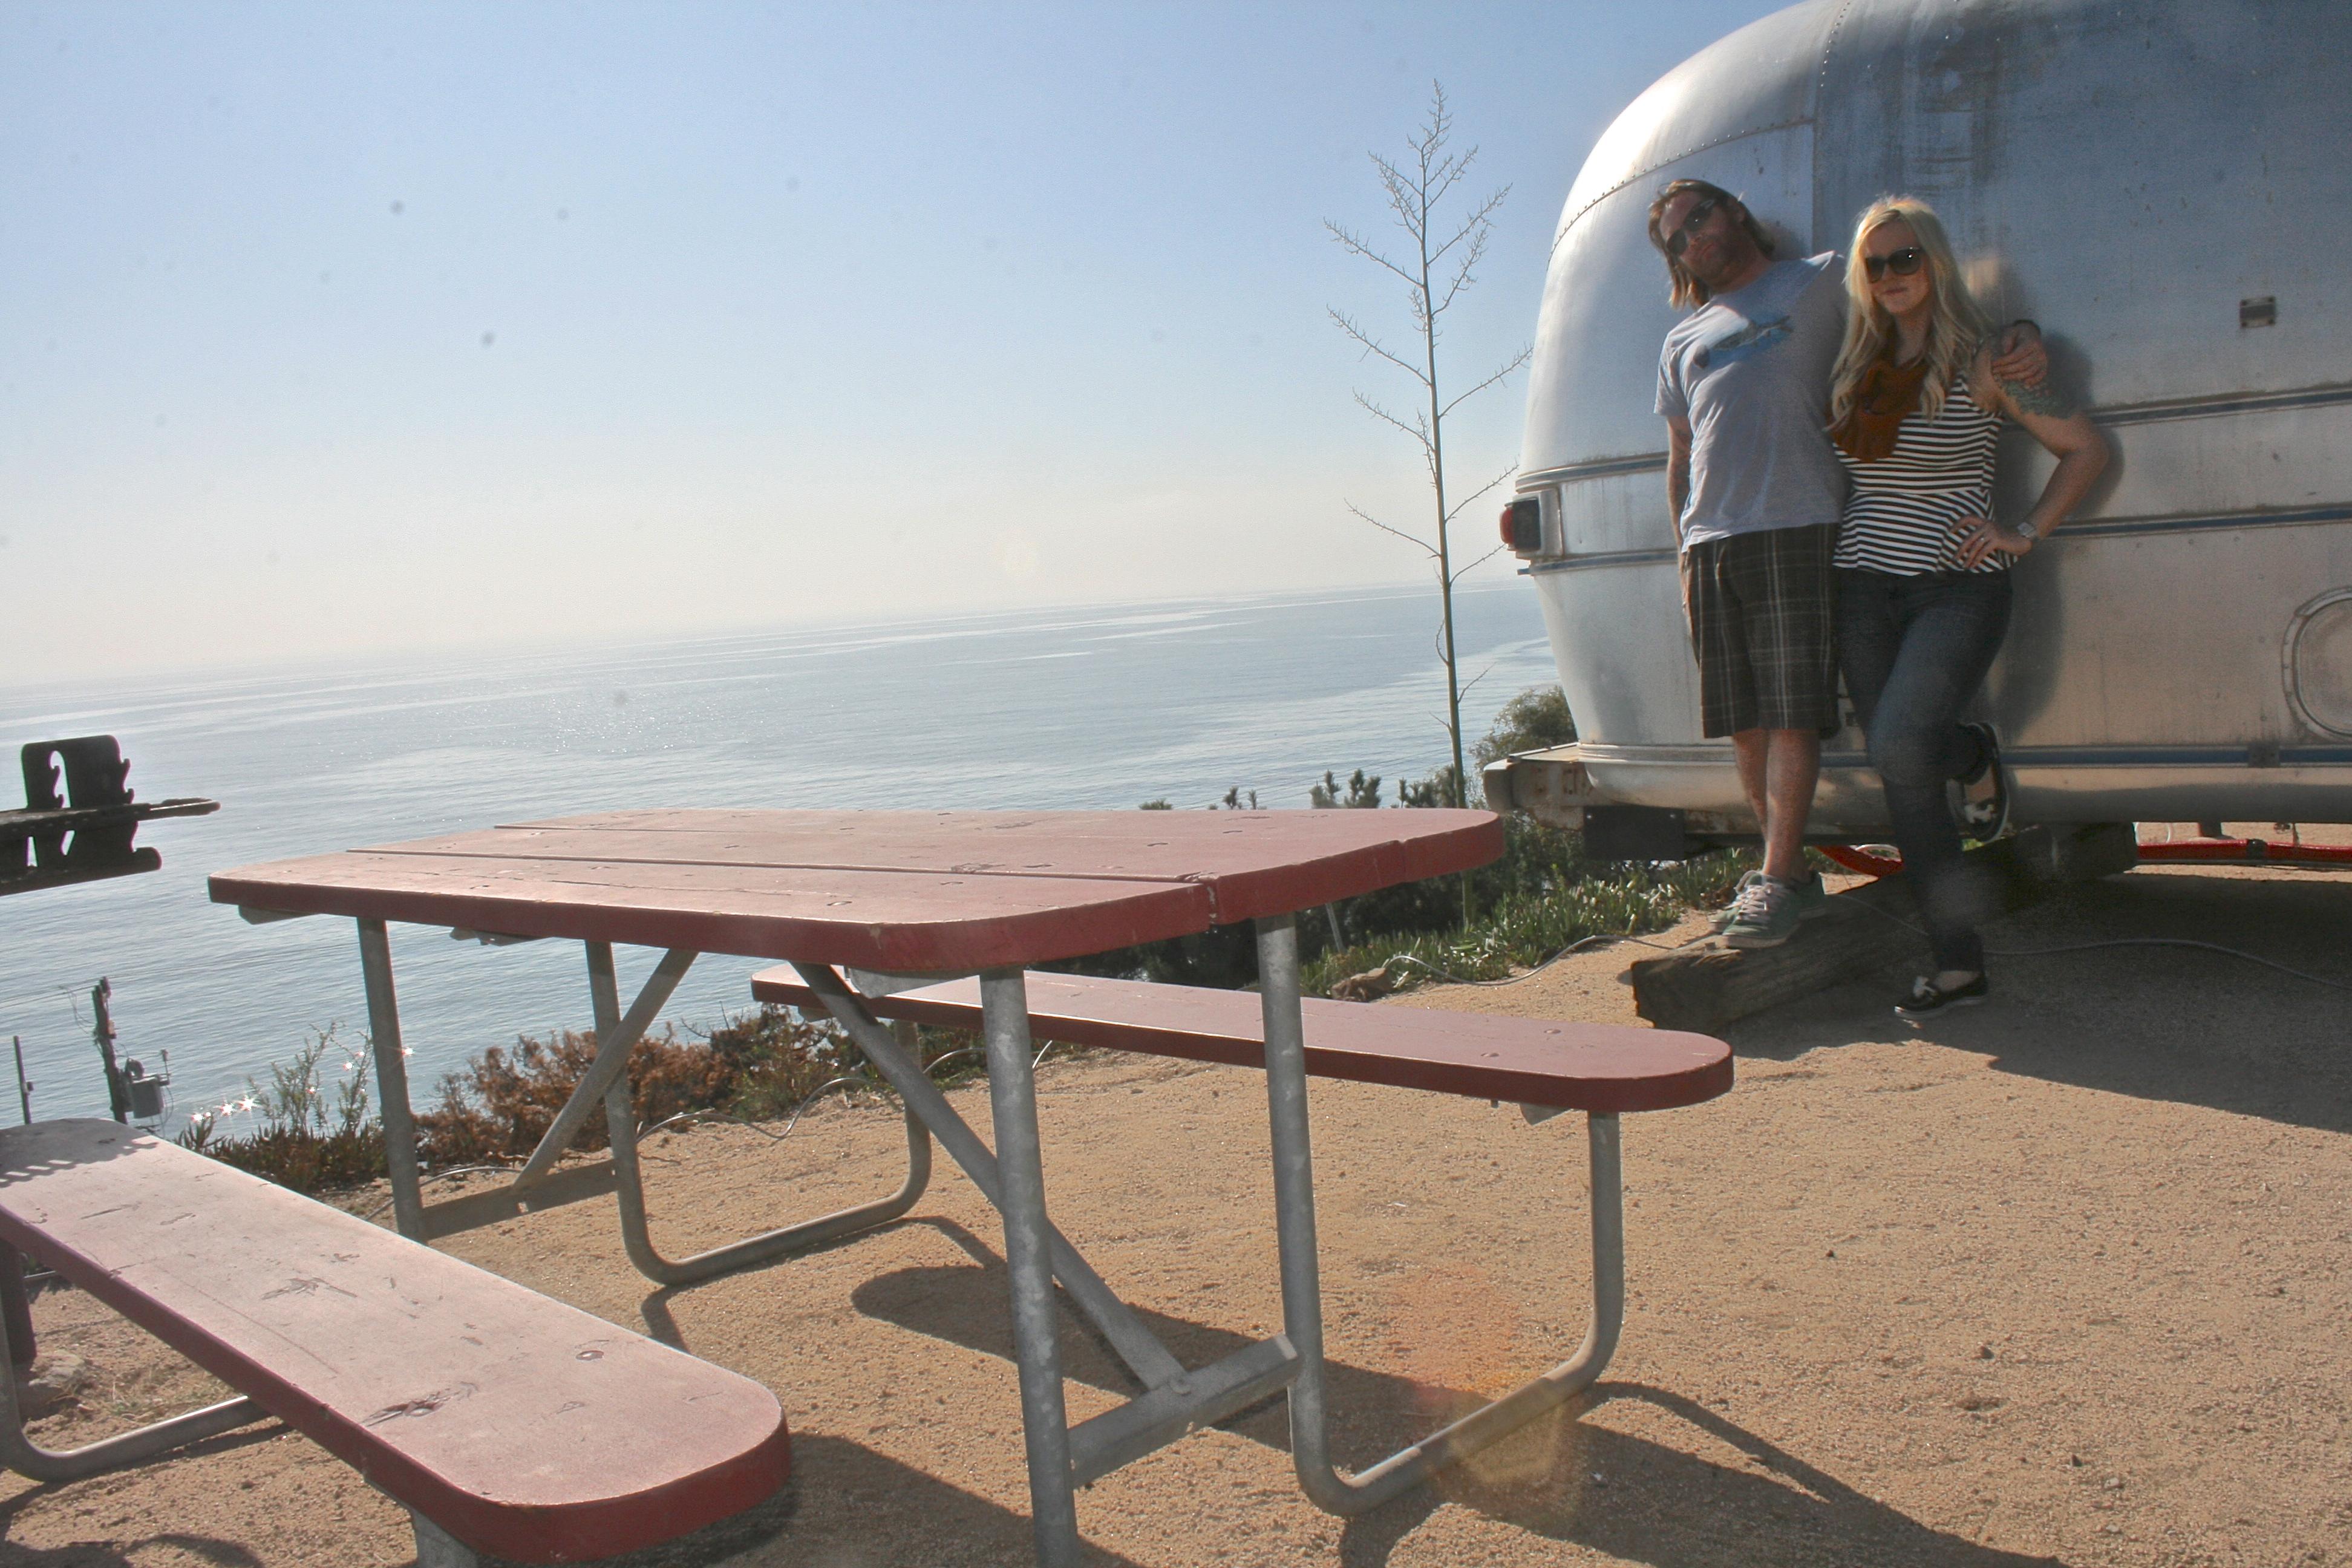 Our Maiden Voyage to Malibu Beach RV Park In Malibu, CA: Day